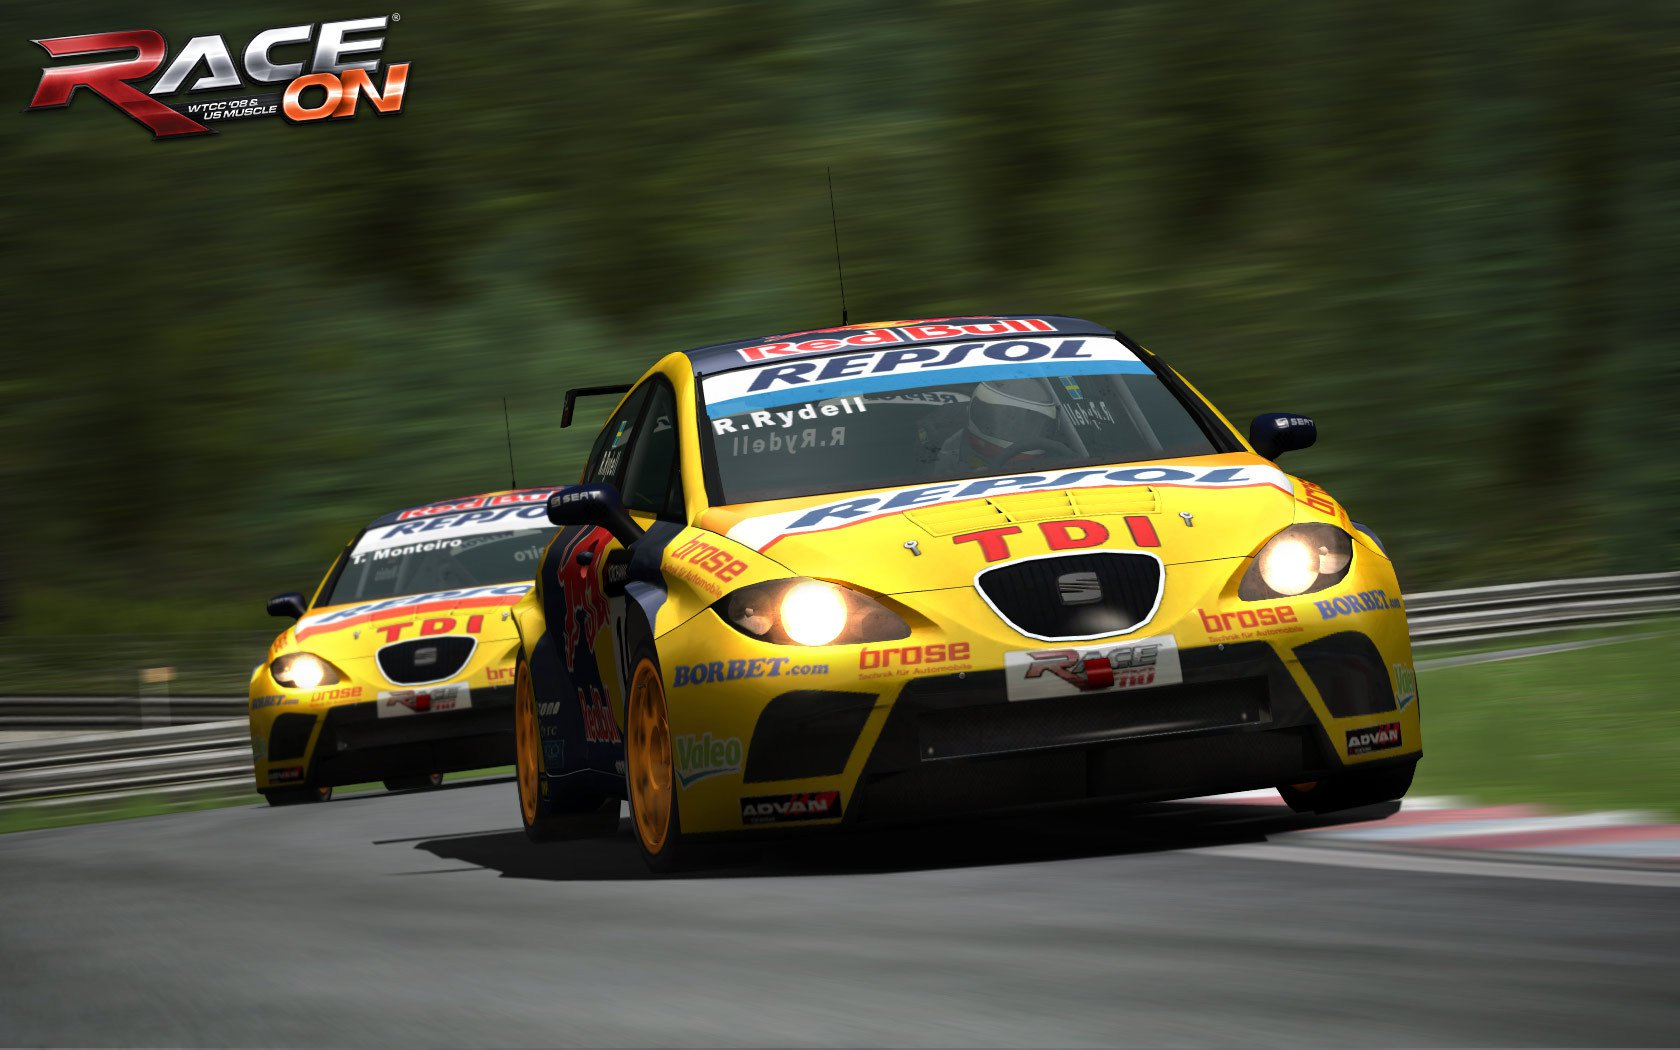 RACE On 22